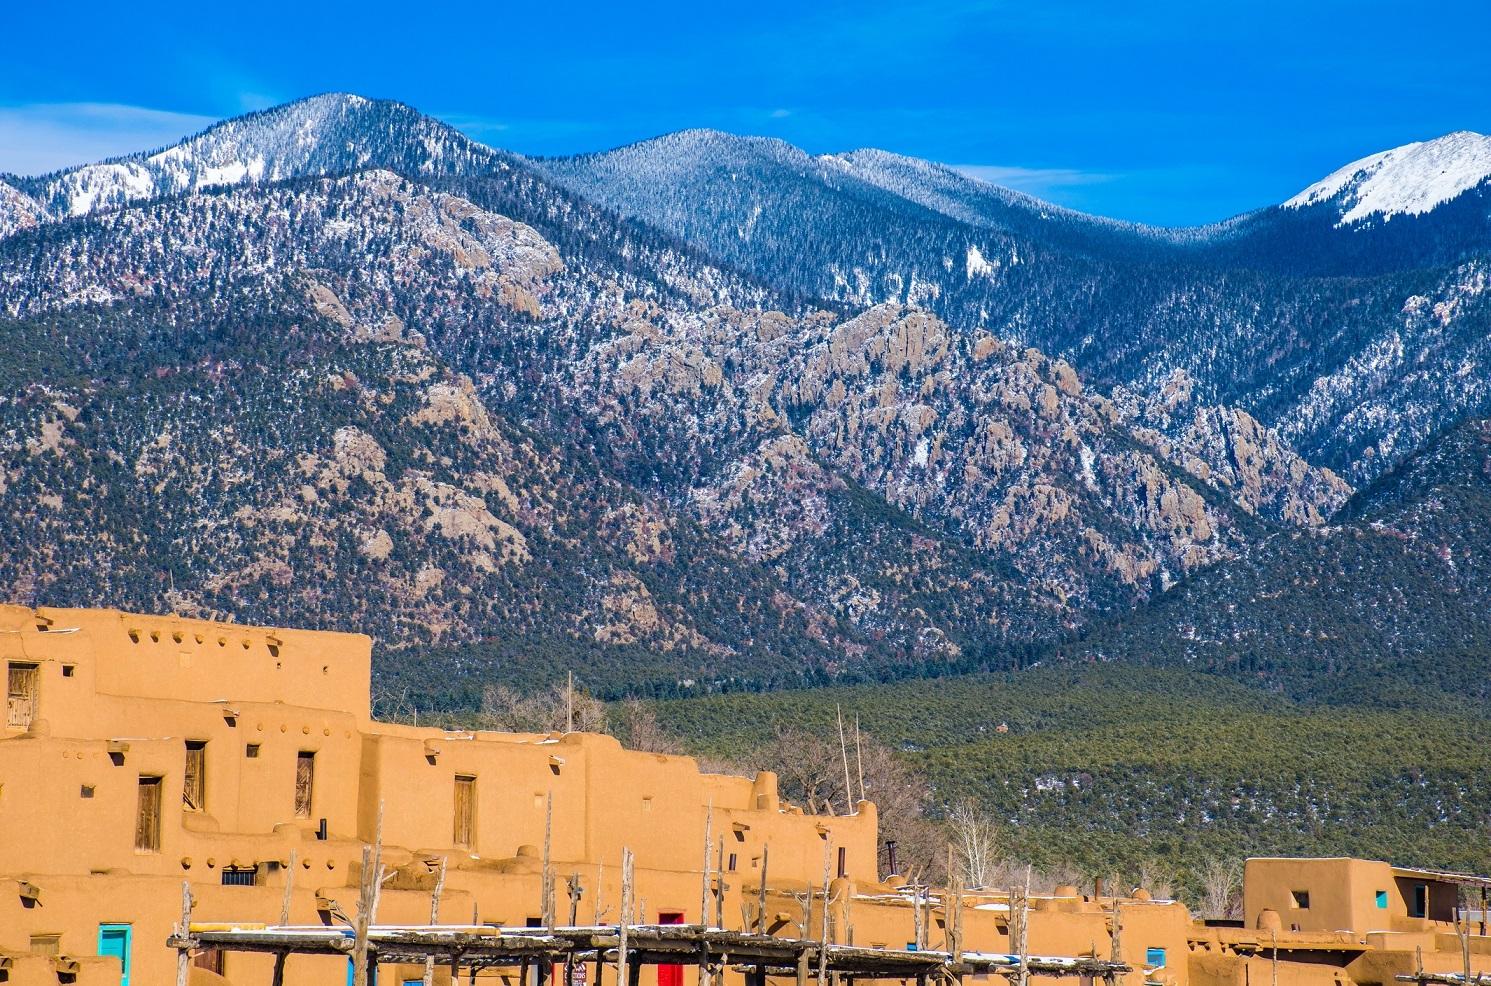 Property Tax Taos New Mexico